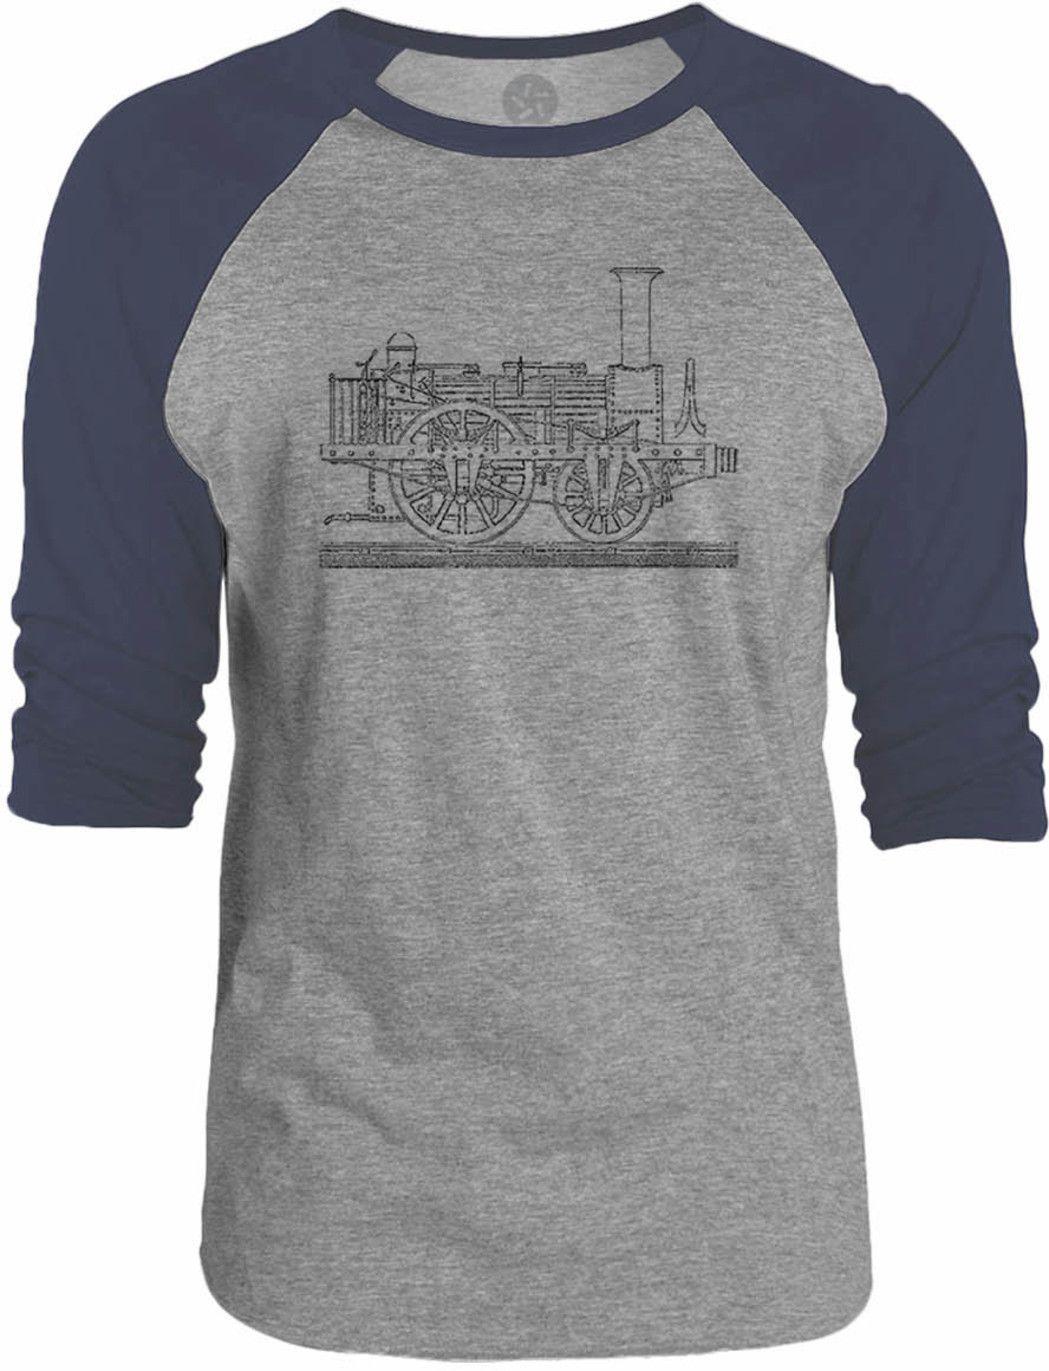 Big texas steam tram blueprint 34 sleeve raglan baseball t shirt big texas steam tram blueprint 34 sleeve raglan baseball t shirt malvernweather Gallery